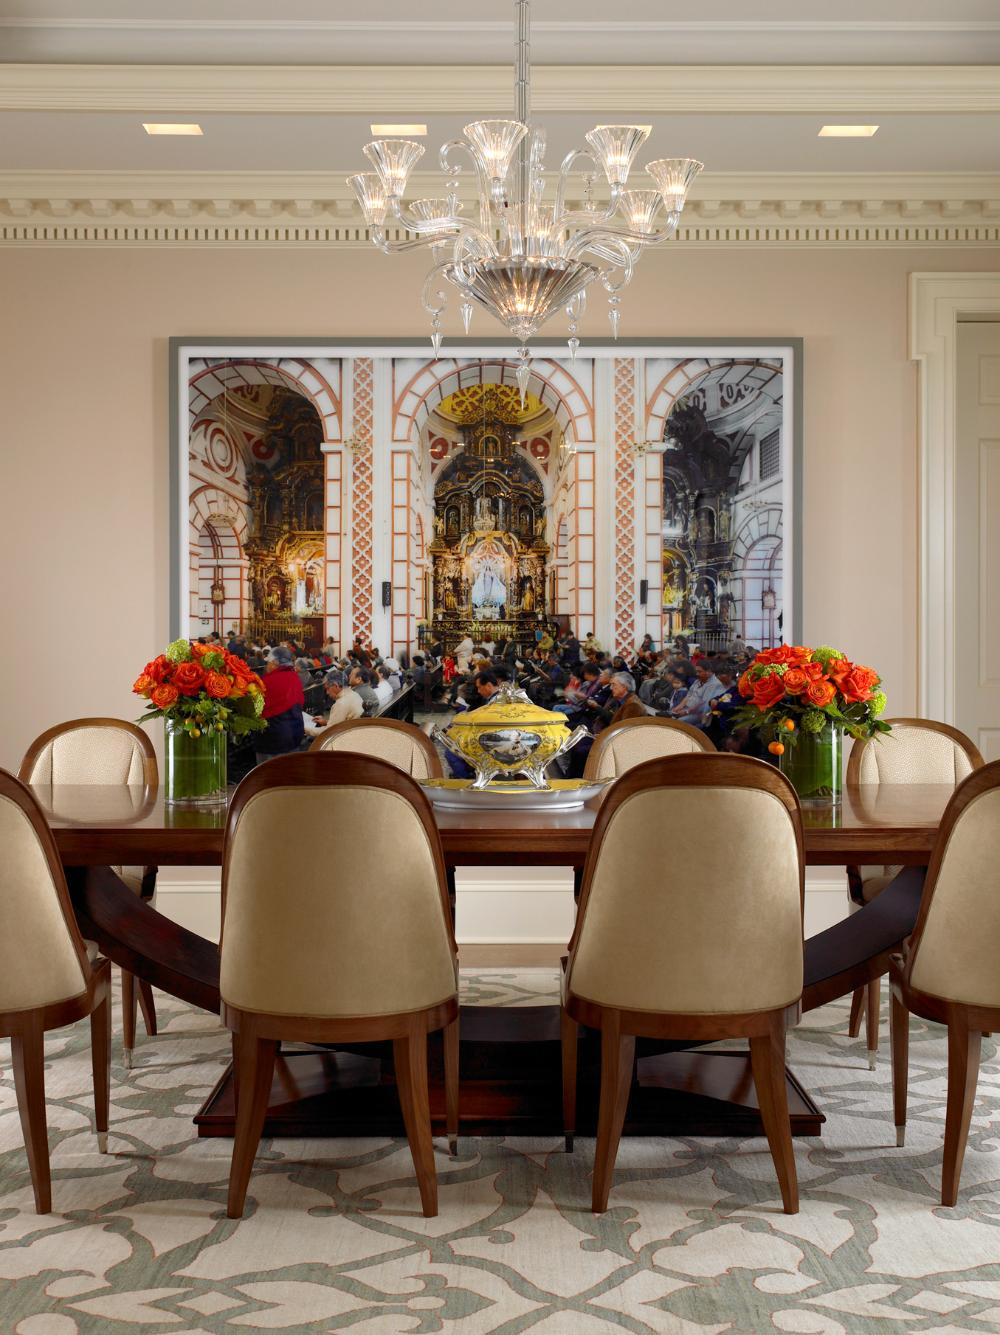 Kirchhoff & Associates Architects in 2020 | Modern dining ...